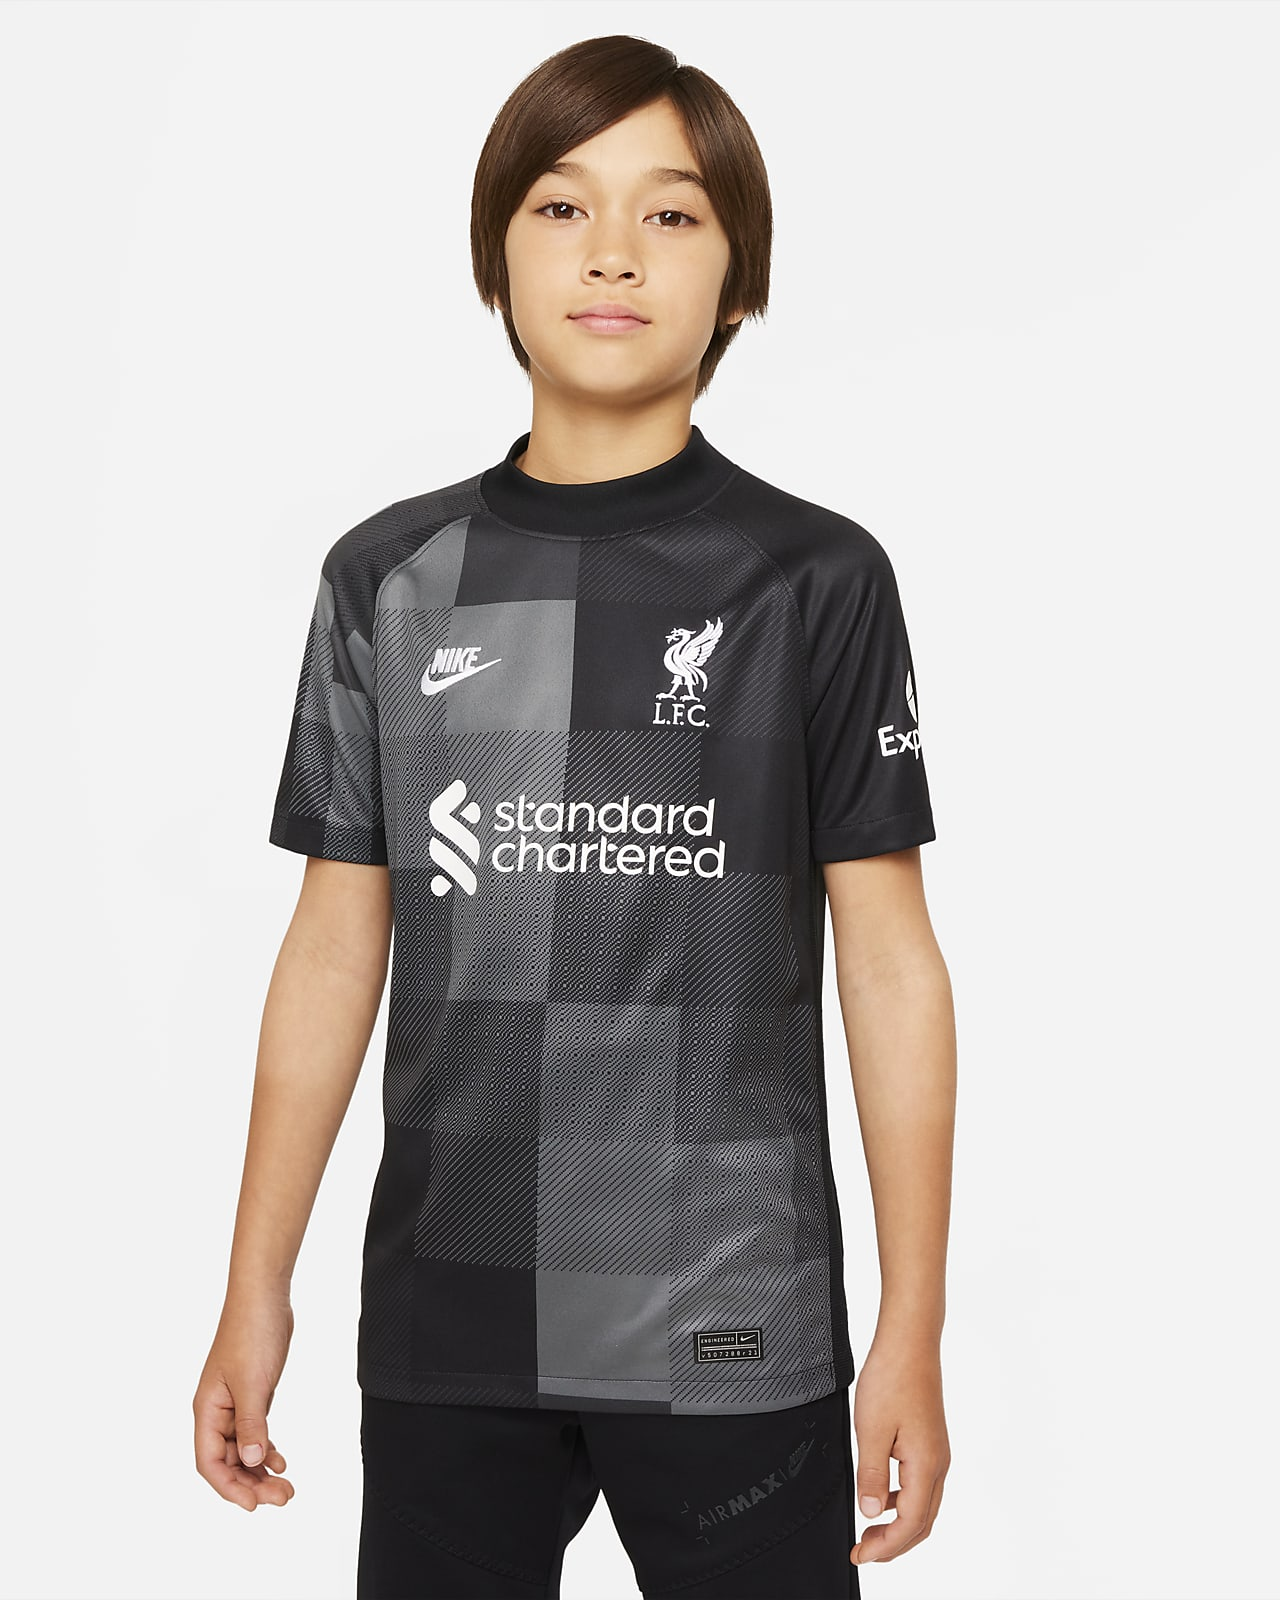 Liverpool F.C. 2021/22 Stadium Goalkeeper Older Kids' Football Jersey